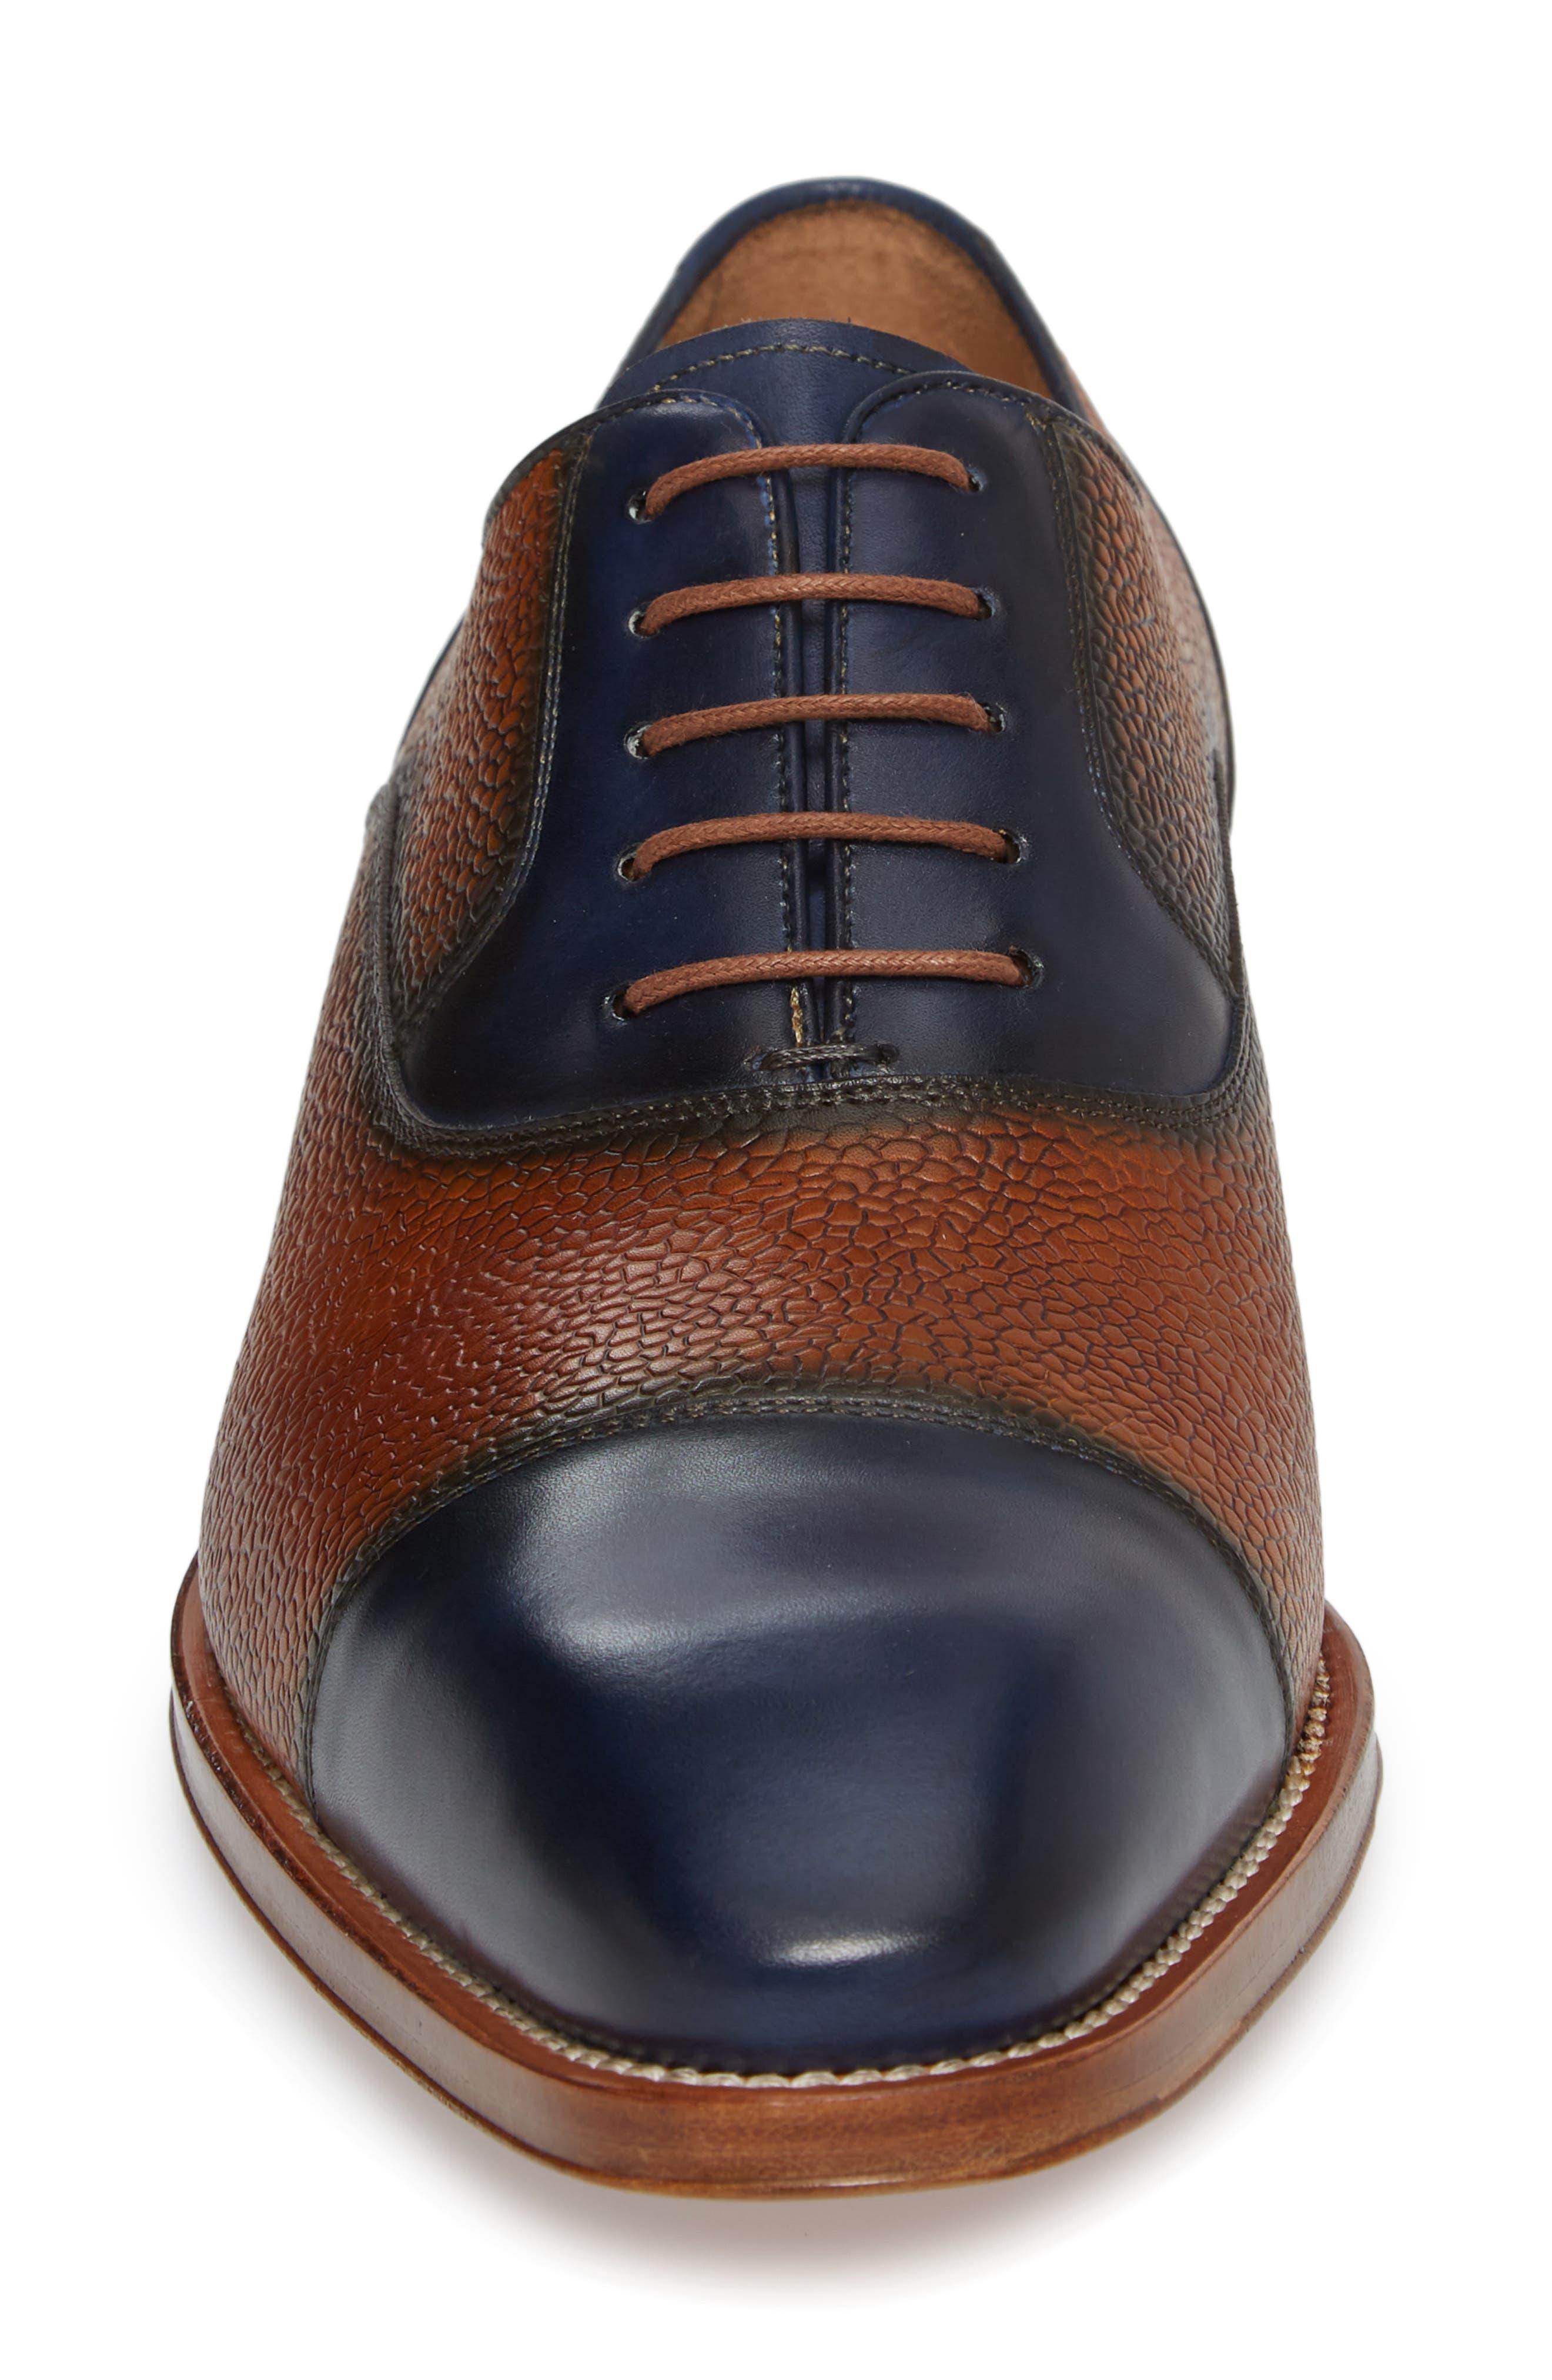 Verino Cap Toe Oxford,                             Alternate thumbnail 4, color,                             Blue/ Tan Leather